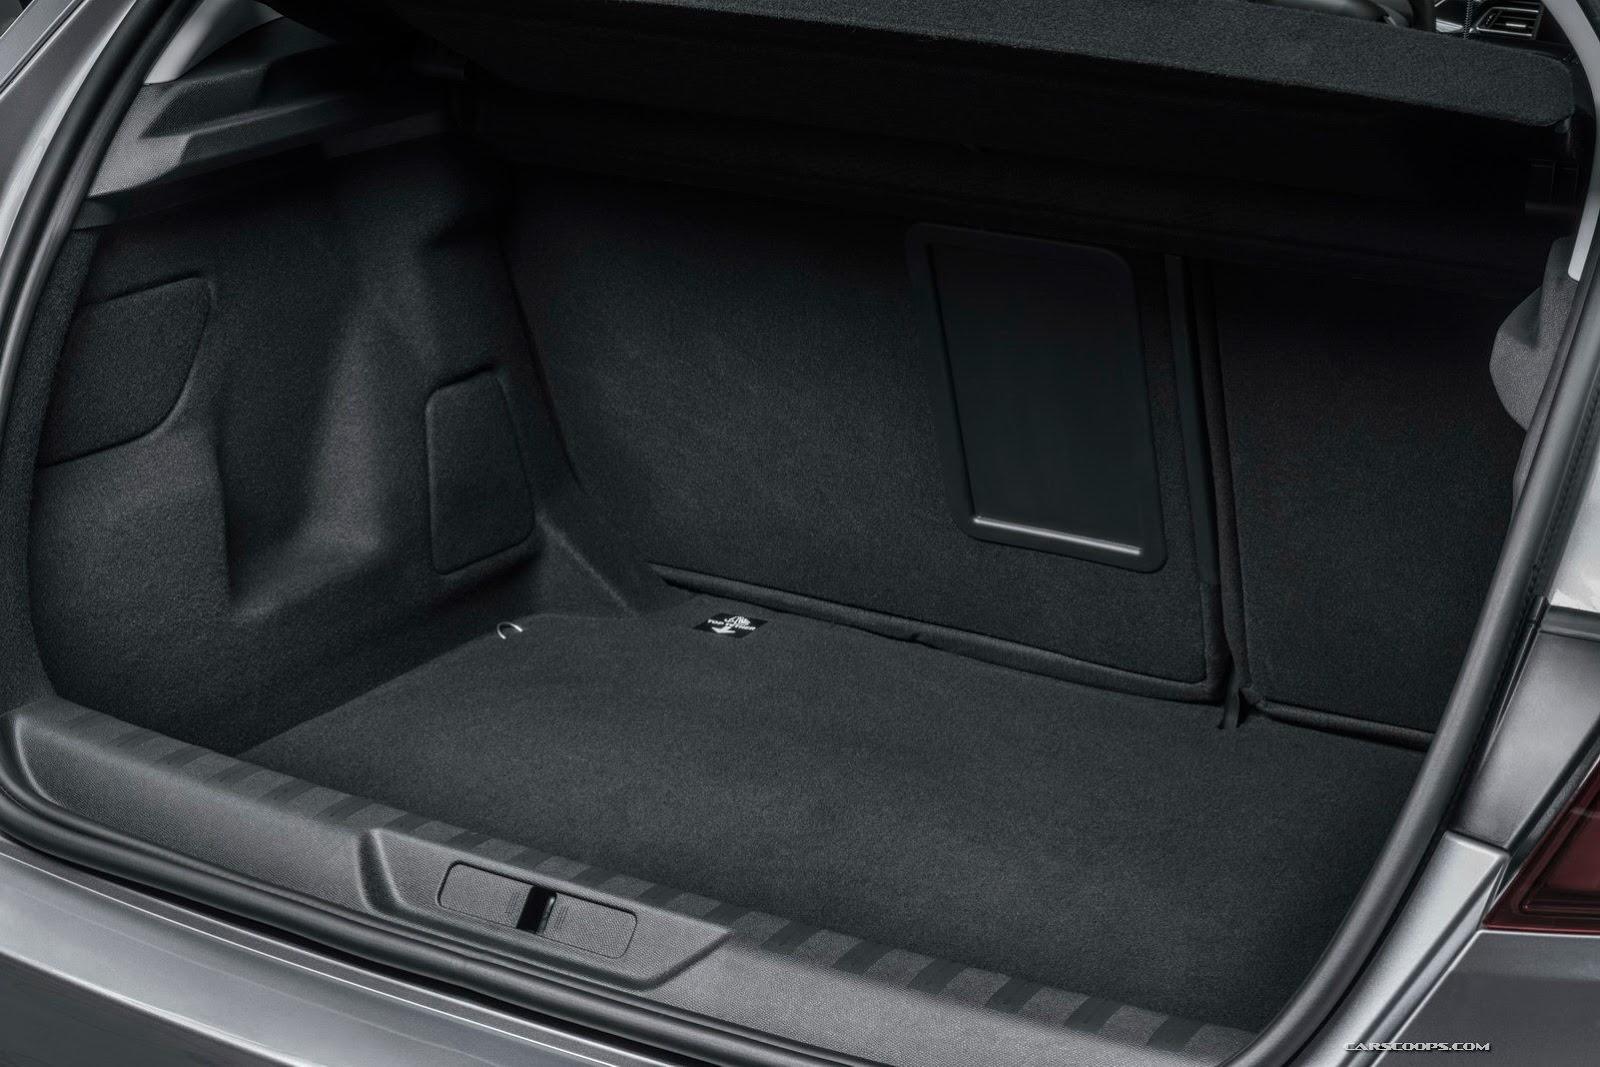 2014-Peugeot-308-Hatch-Carscoops-131%25255B2%25255D.jpg